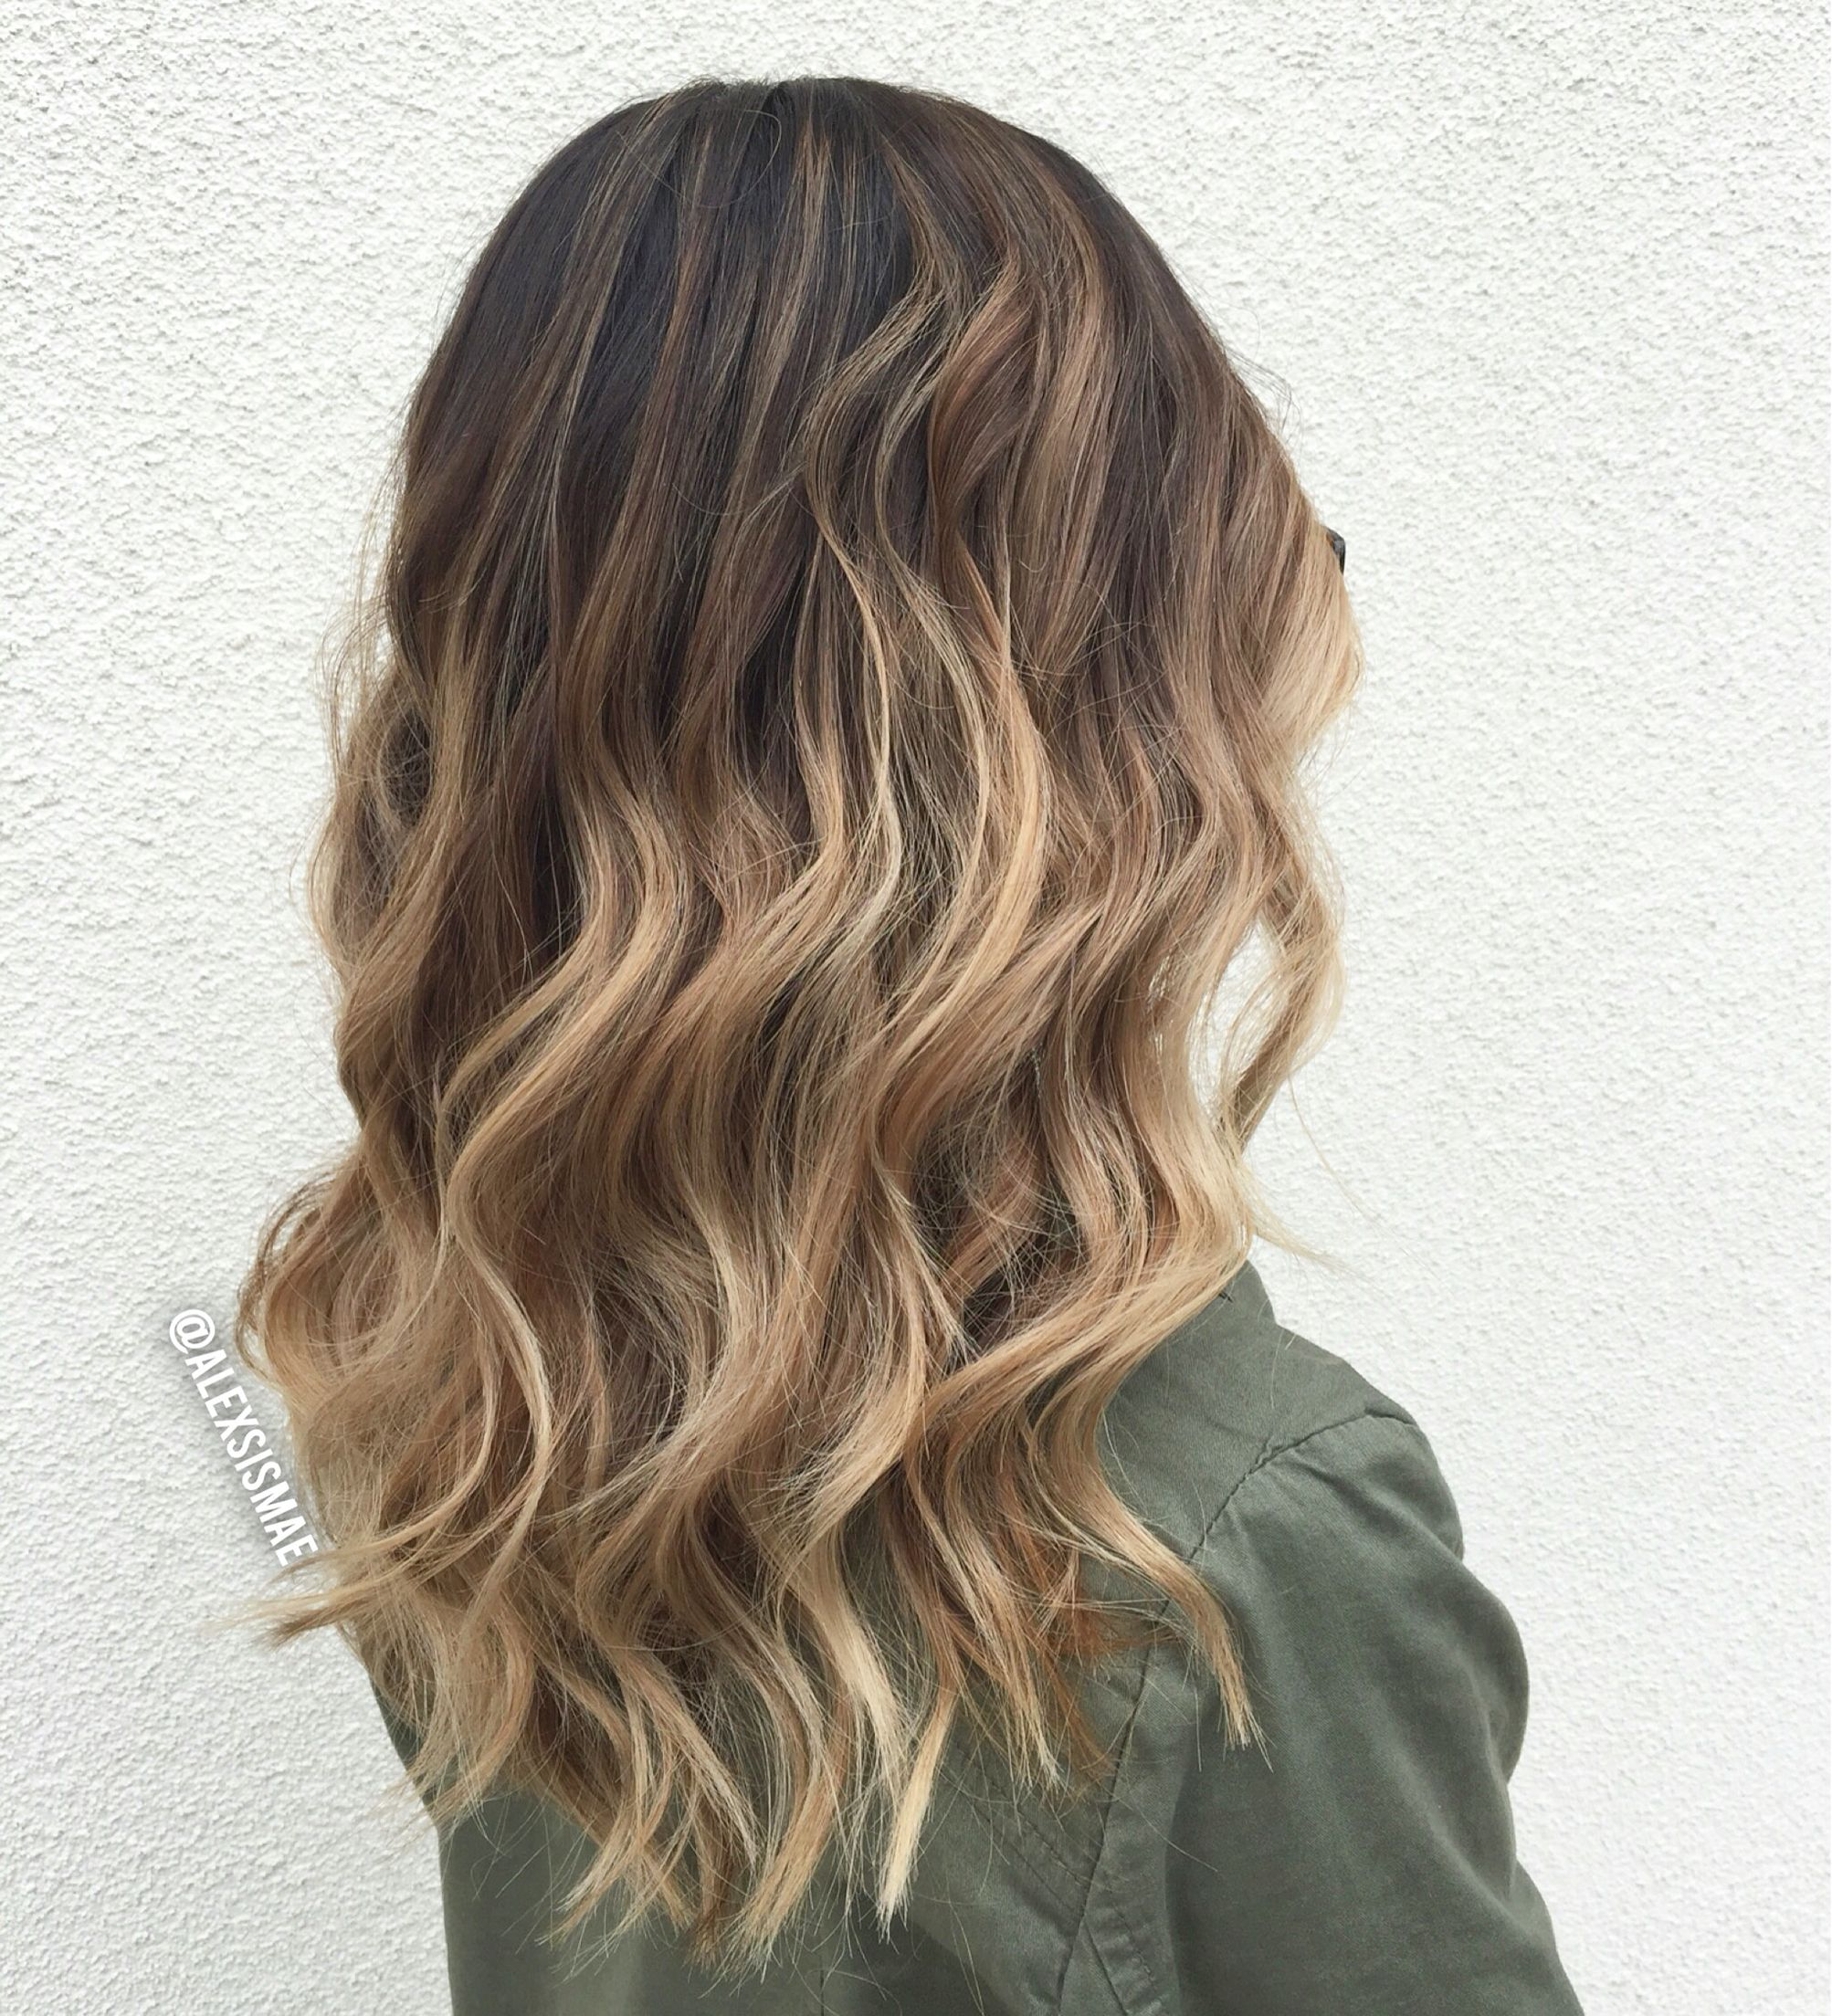 Dark Brown To Ashy Blonde Sombre Balayage Hair Color Done By Alexsismae Balayage Hair Brown To Blonde Balayage Balayage Hair Dark